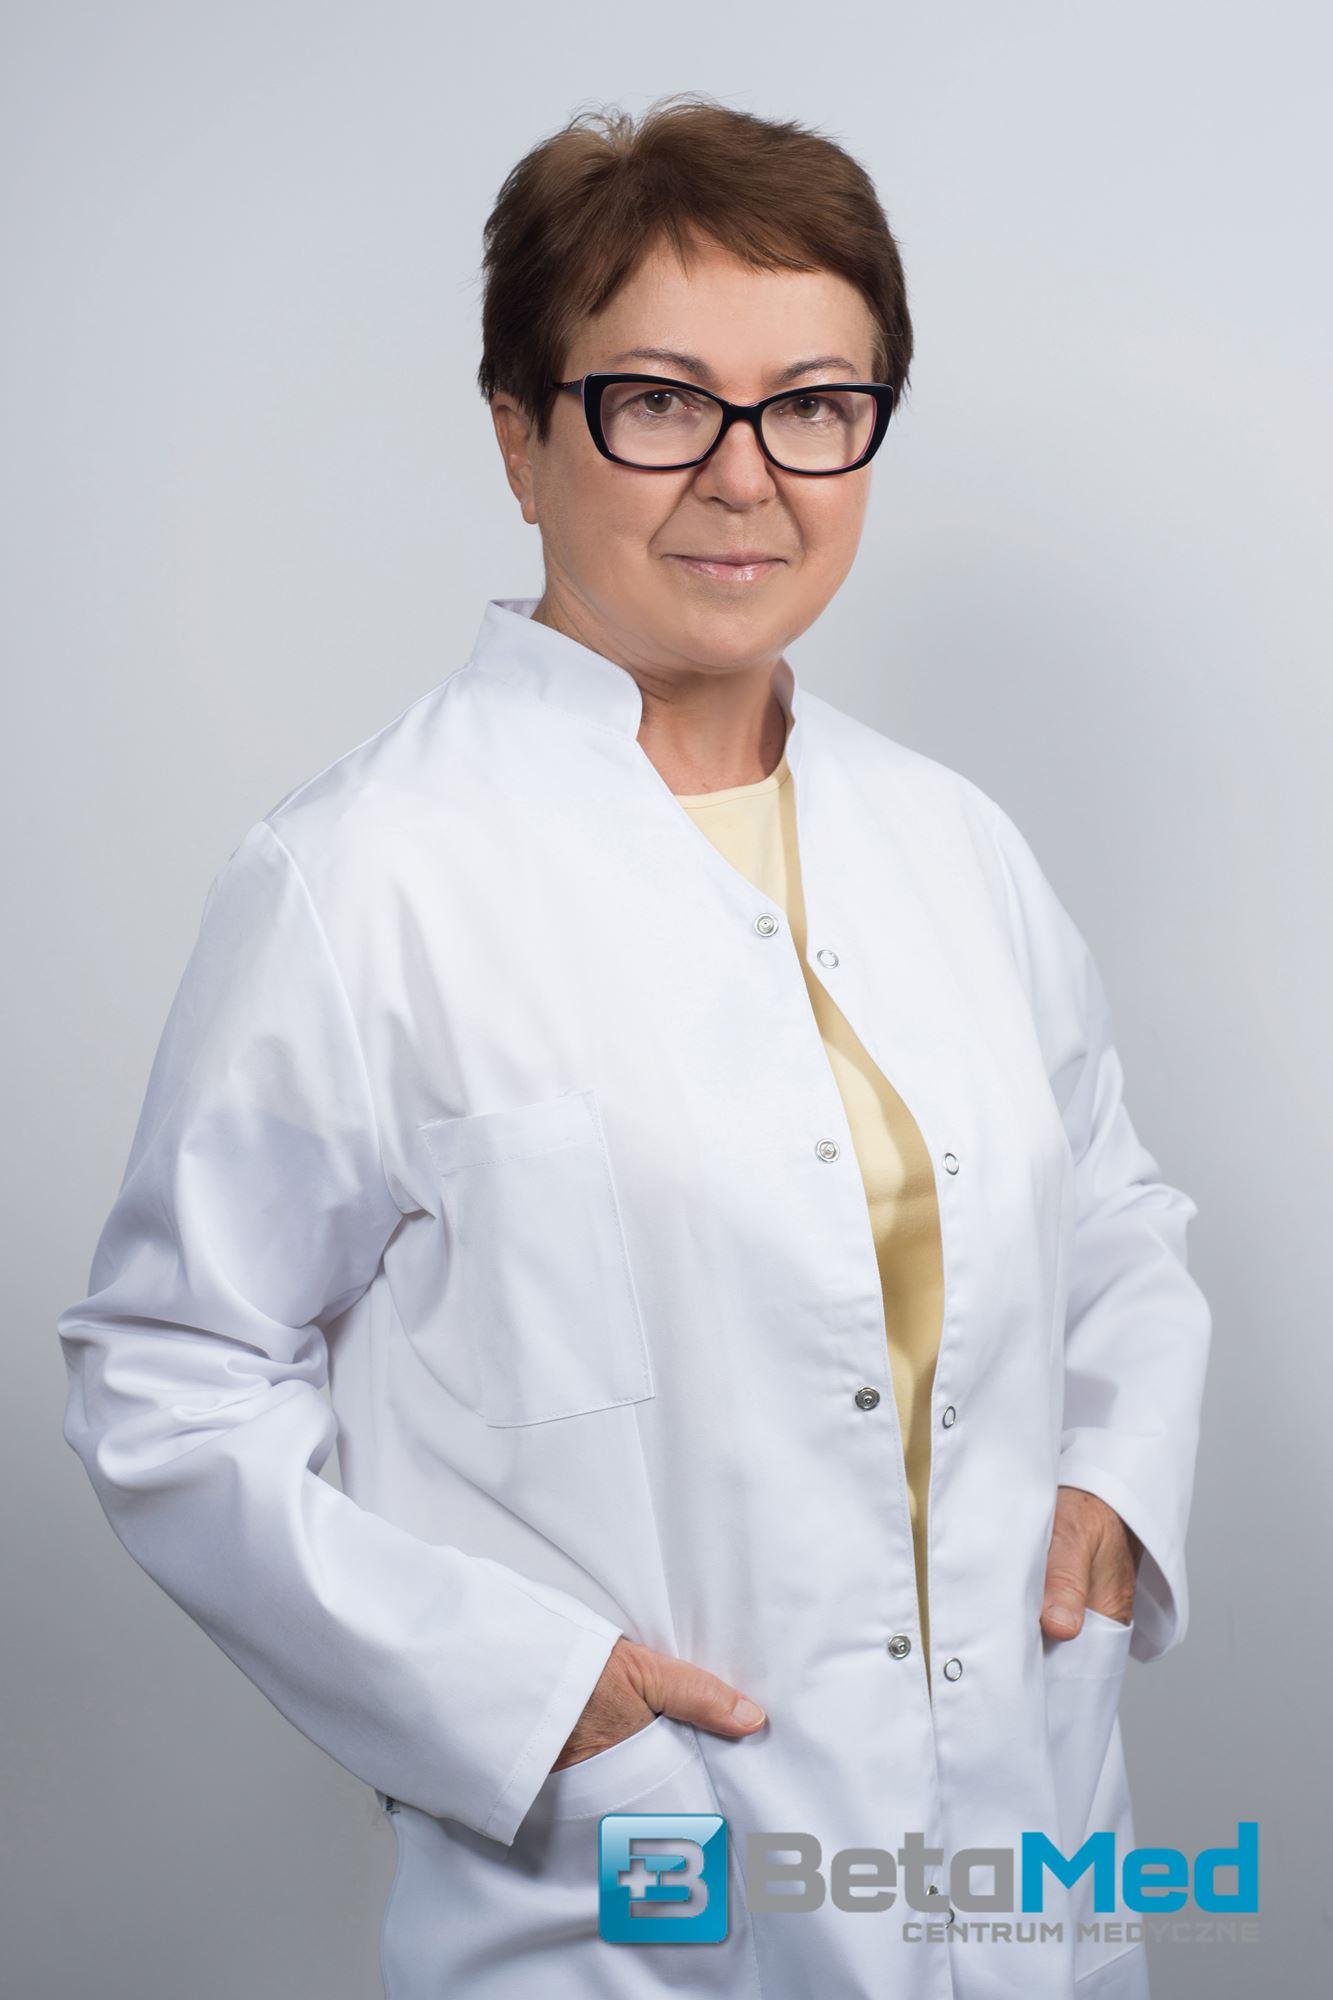 Lek.Lucja Halabowska